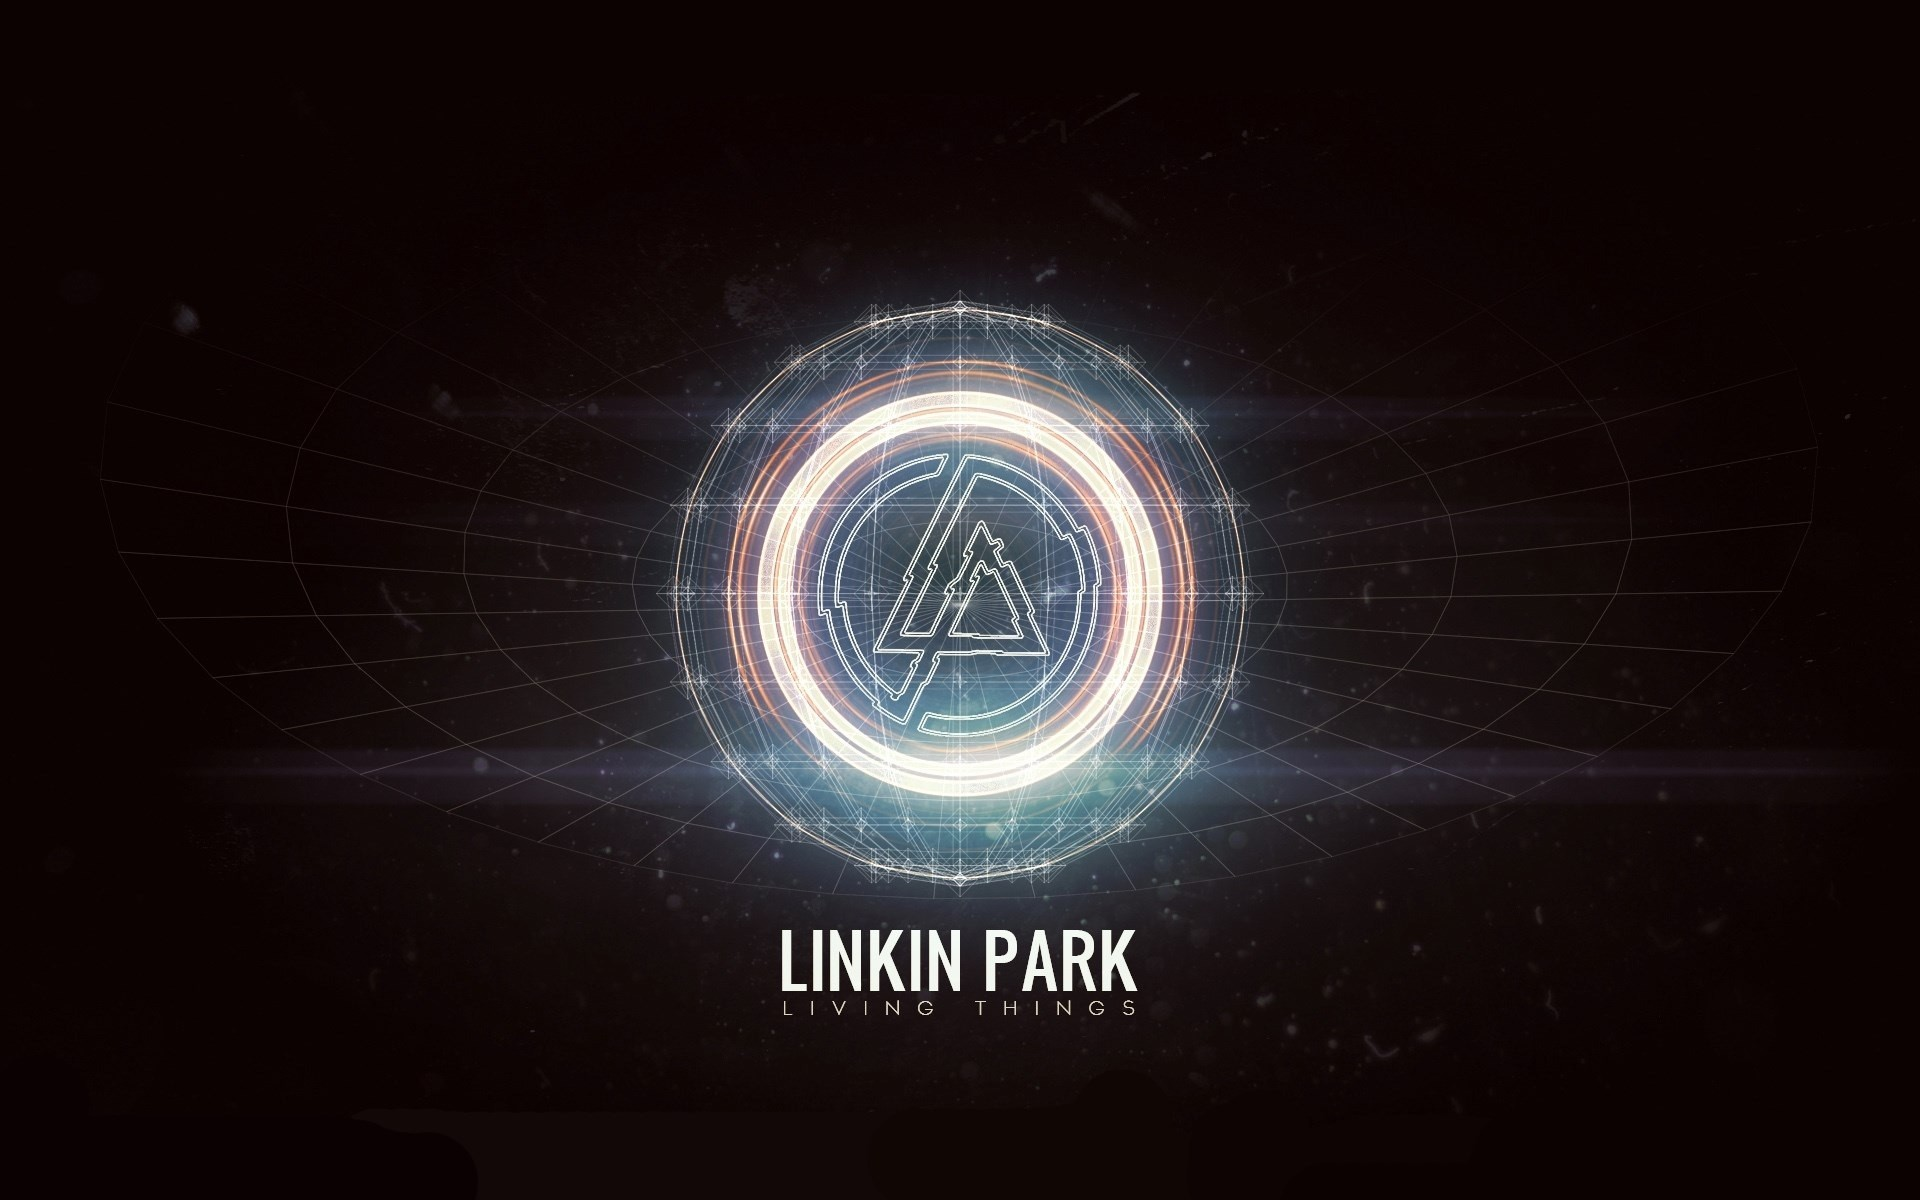 Linkin Park Wallpaper HD 2018 (69+ images)